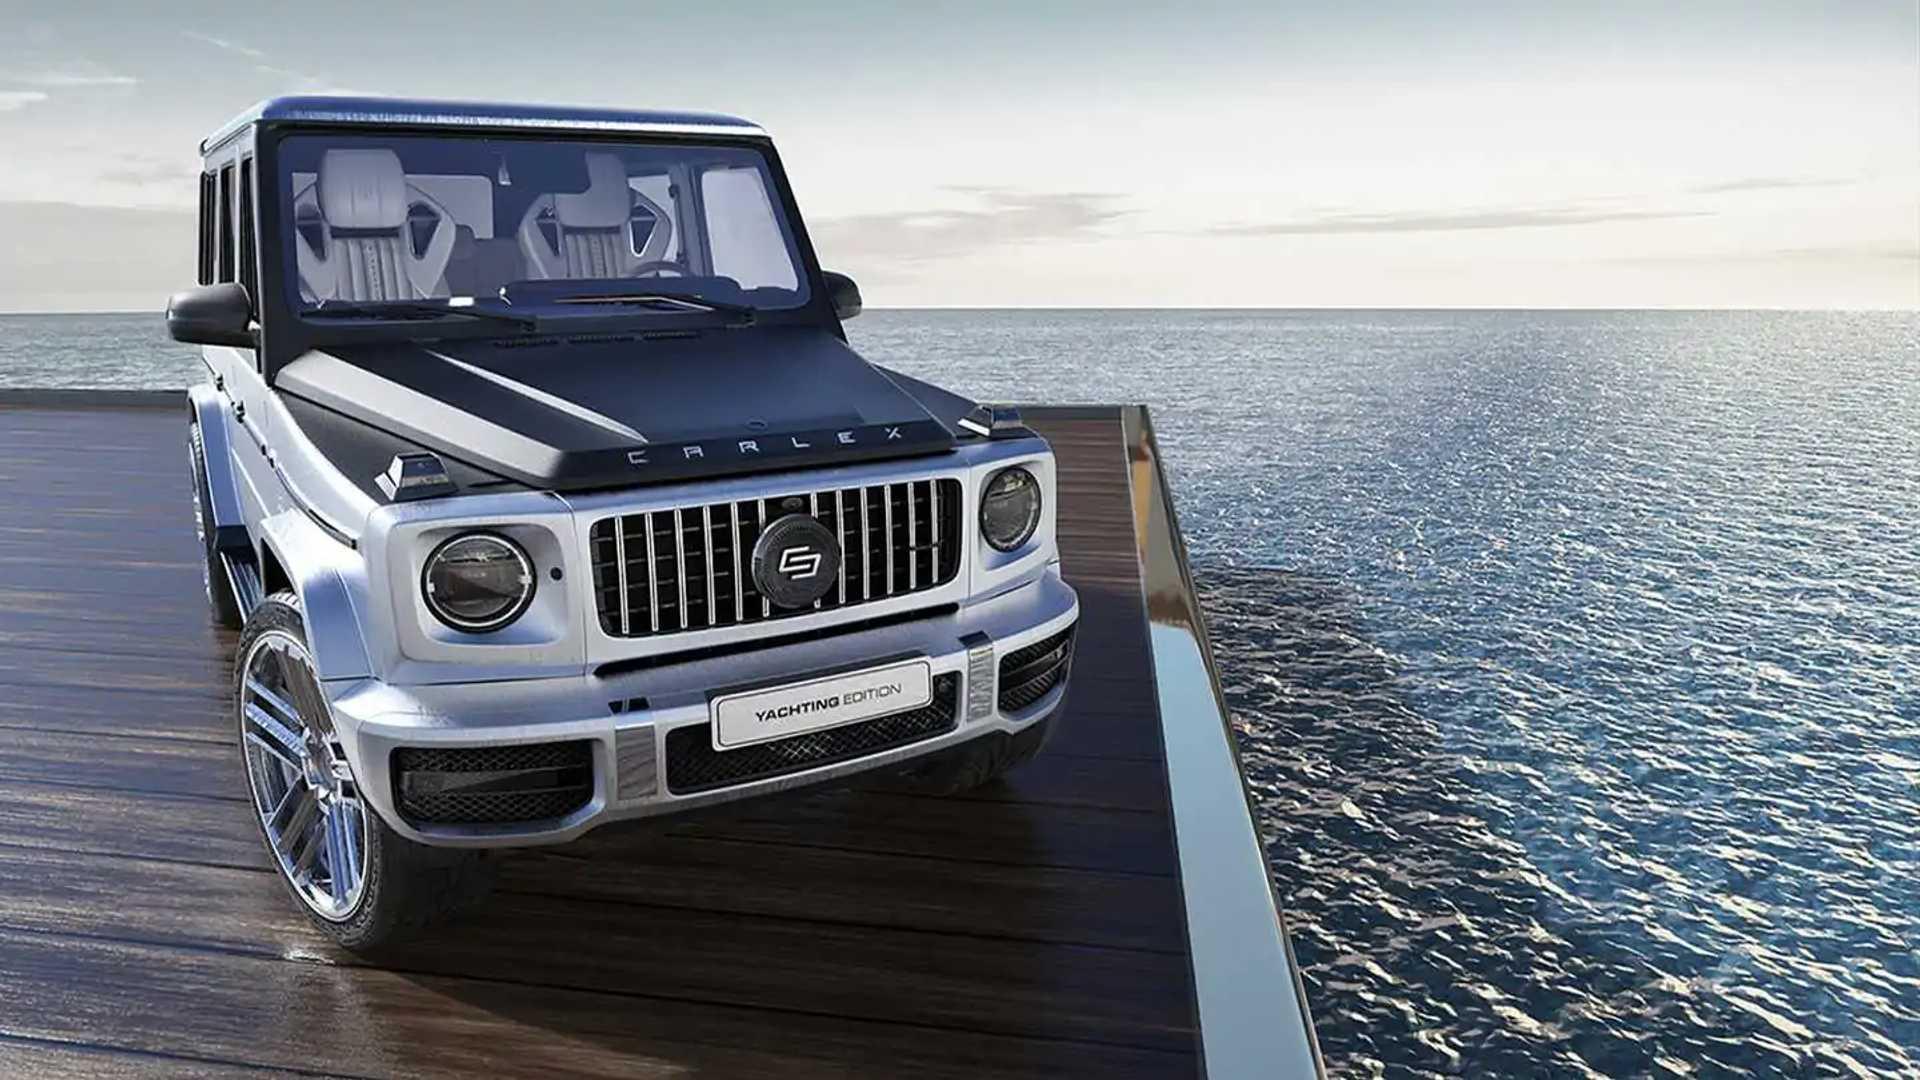 Carlex Design G-Yachting Limited Edition